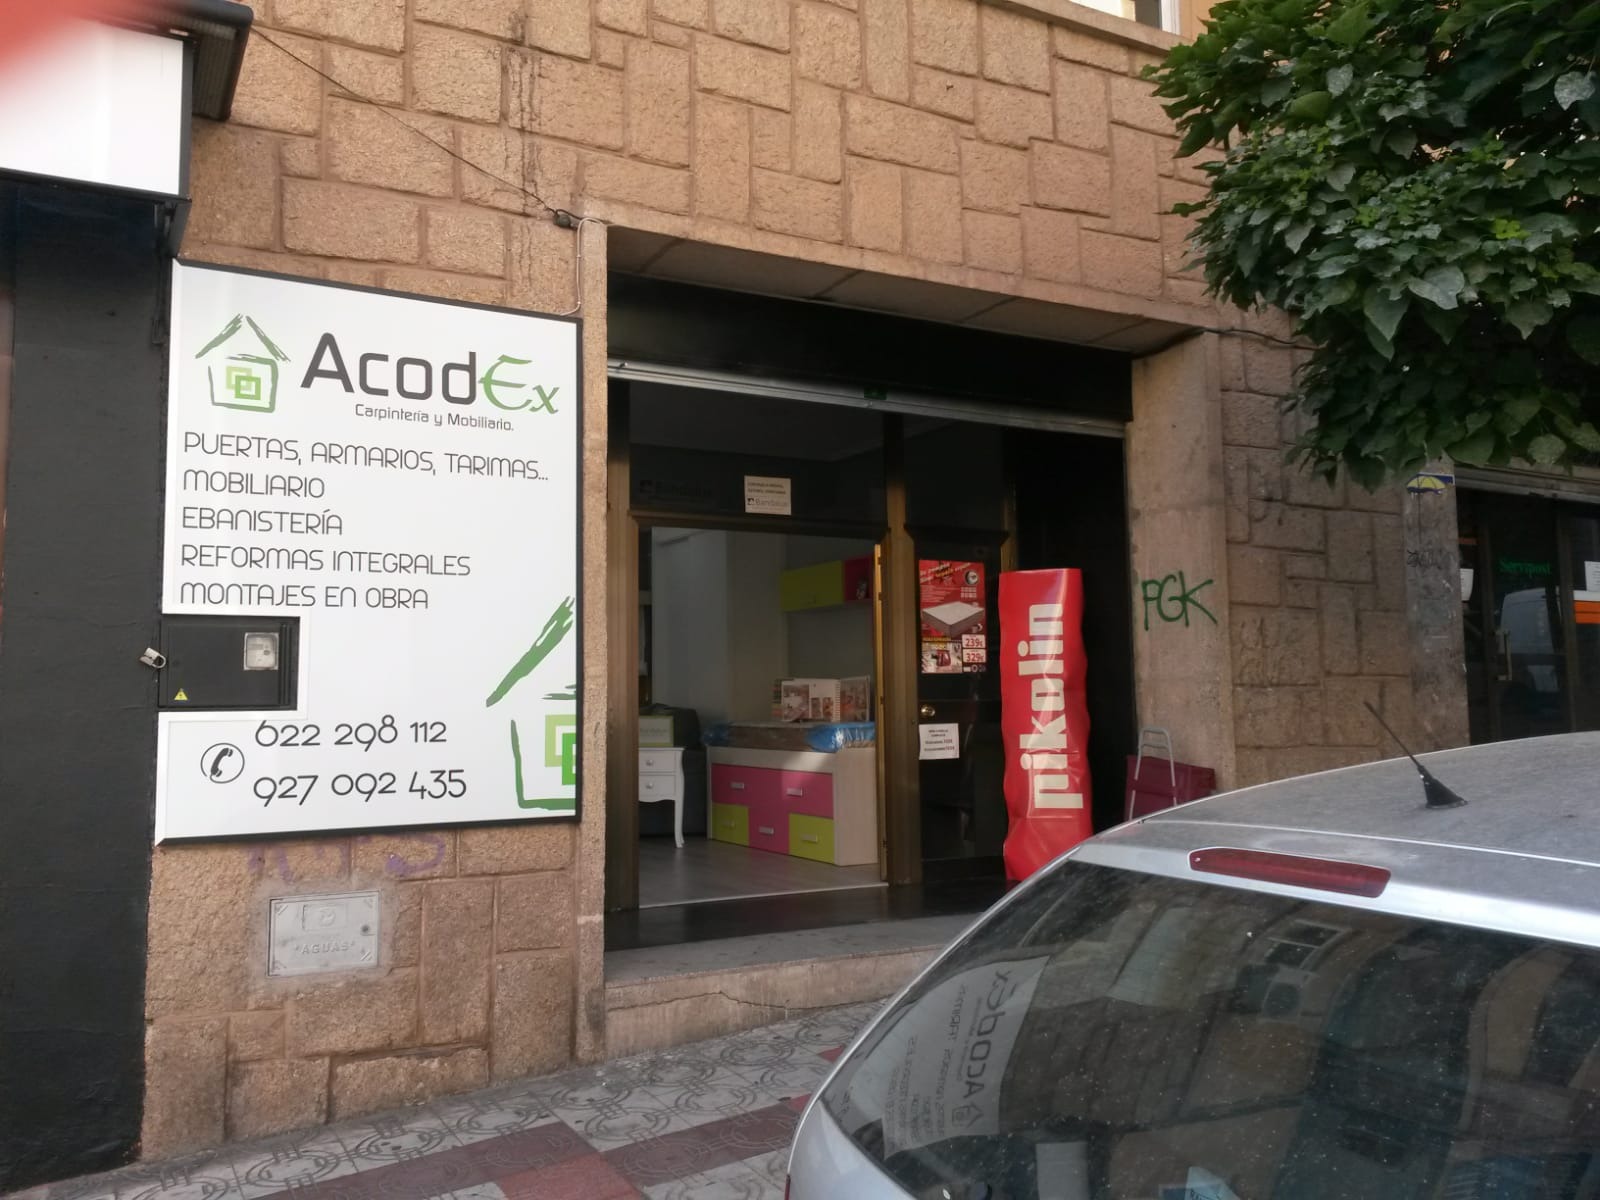 España Tienda de Hogar en Cáceres Acodex